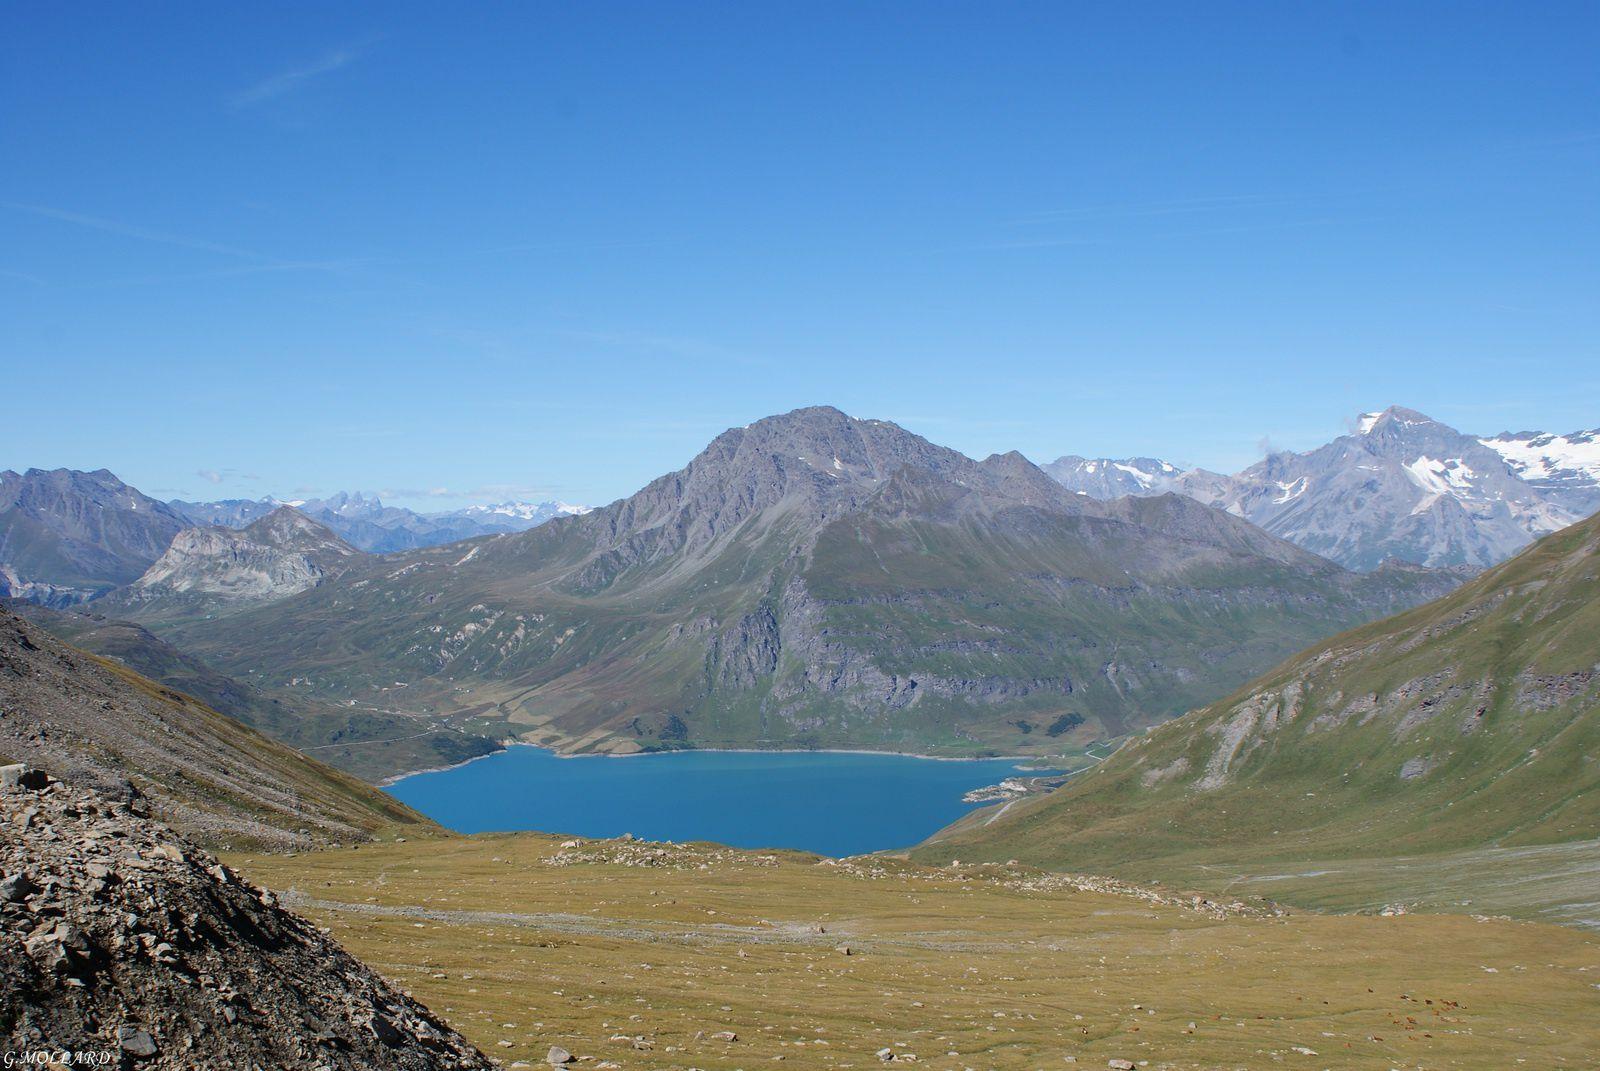 Ballade au dessus du mont -Cenis.